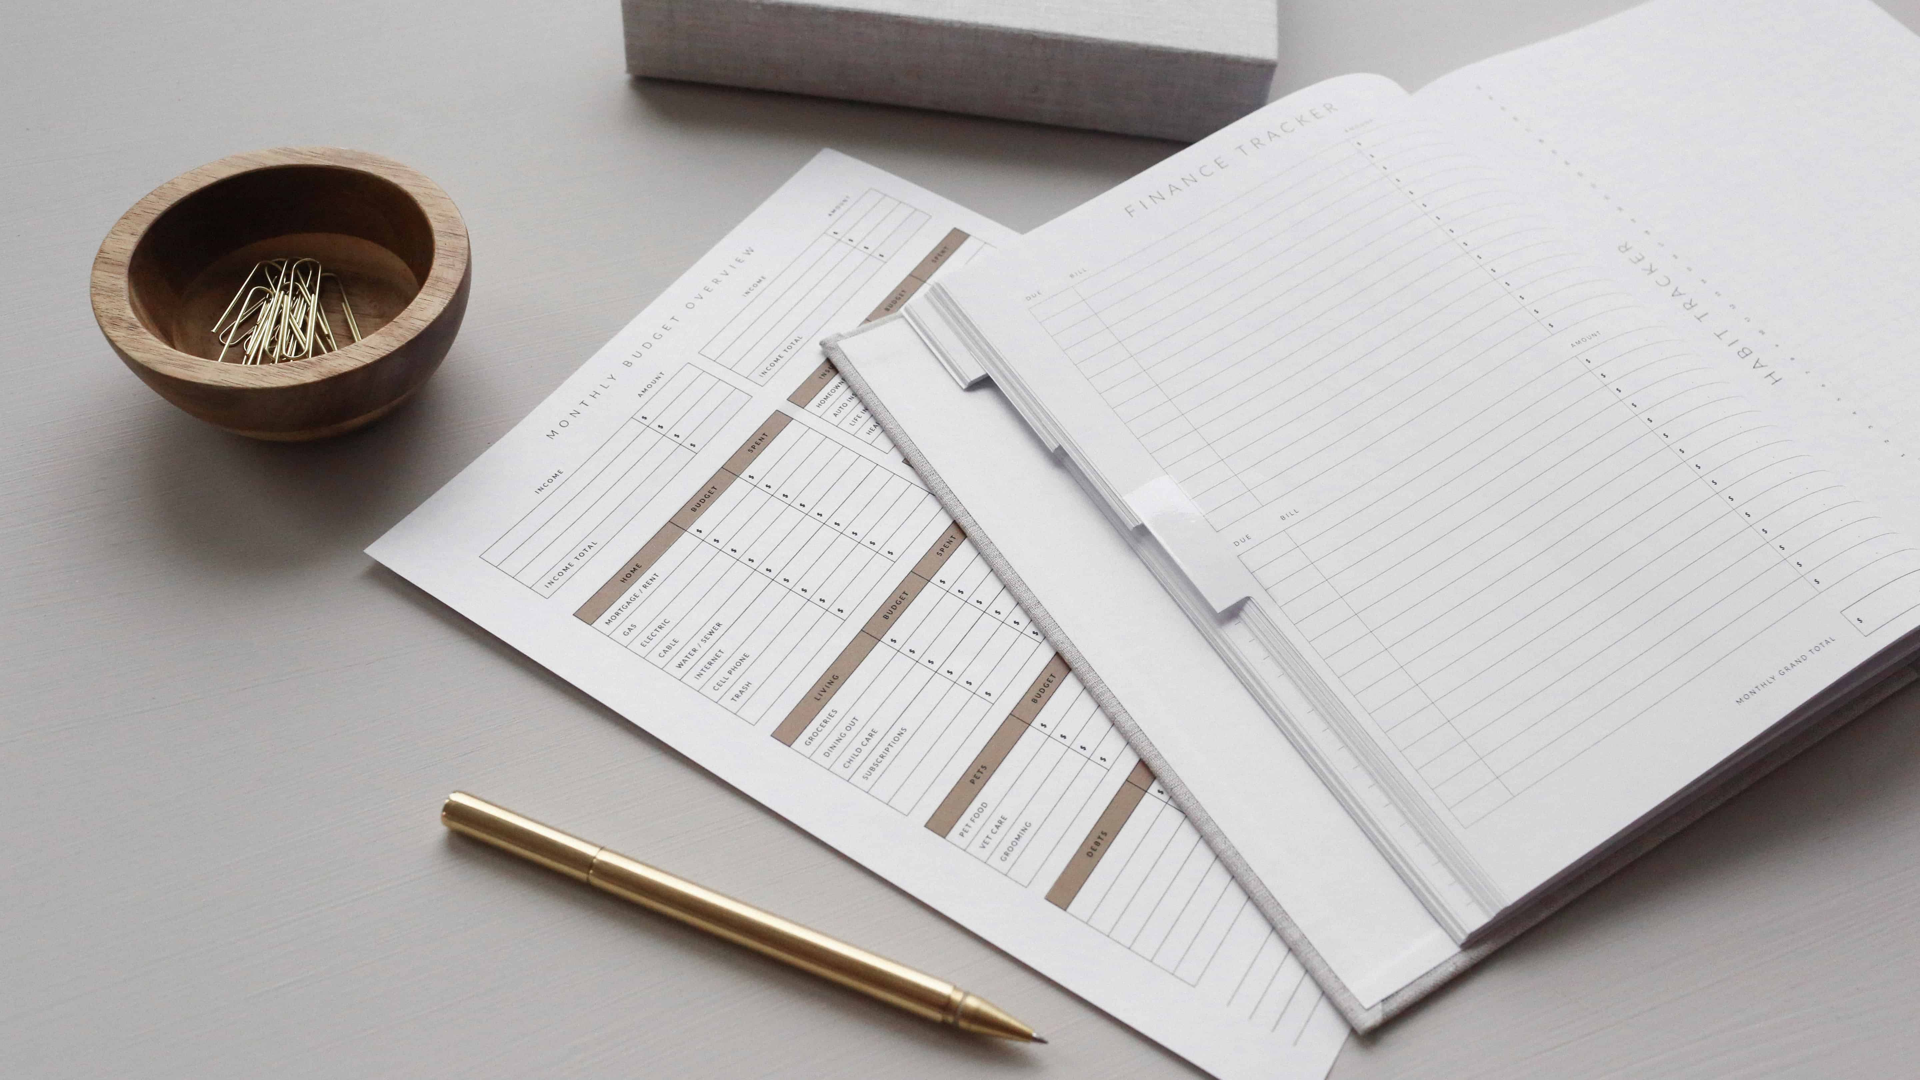 Budget Sheet and Finance Tracker